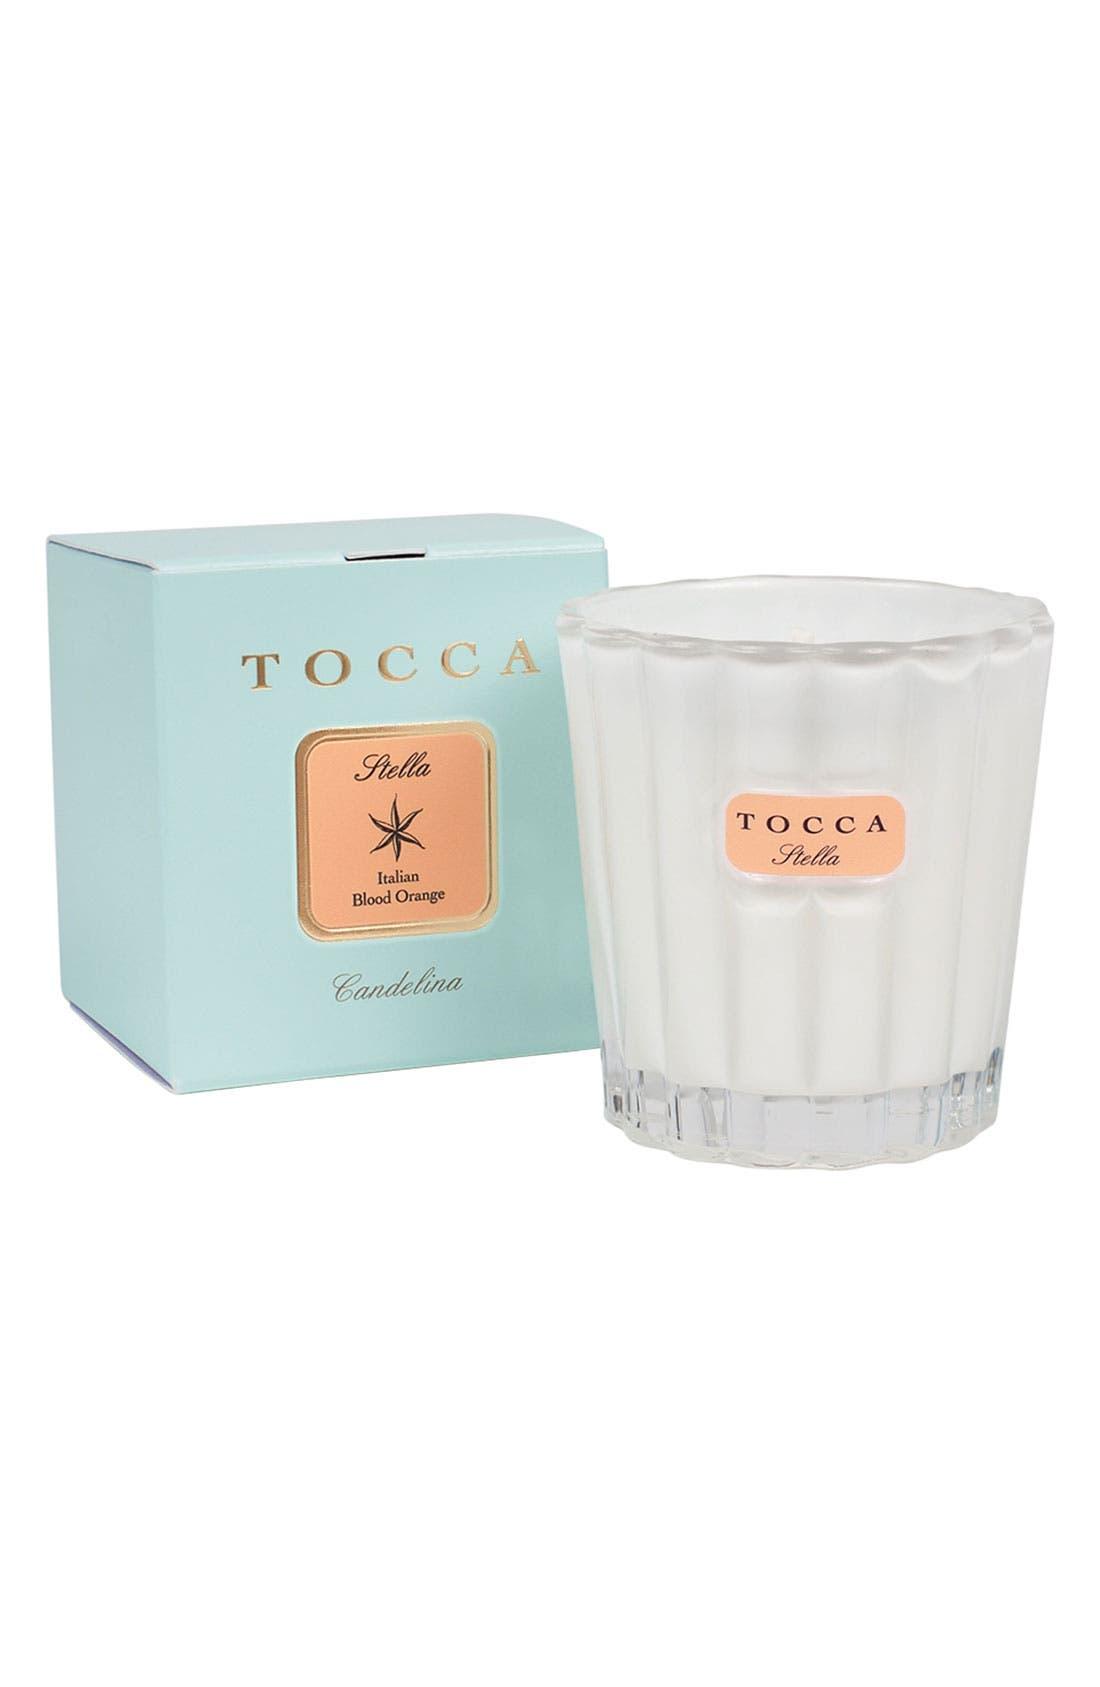 Alternate Image 3  - TOCCA 'Stella' Candelina